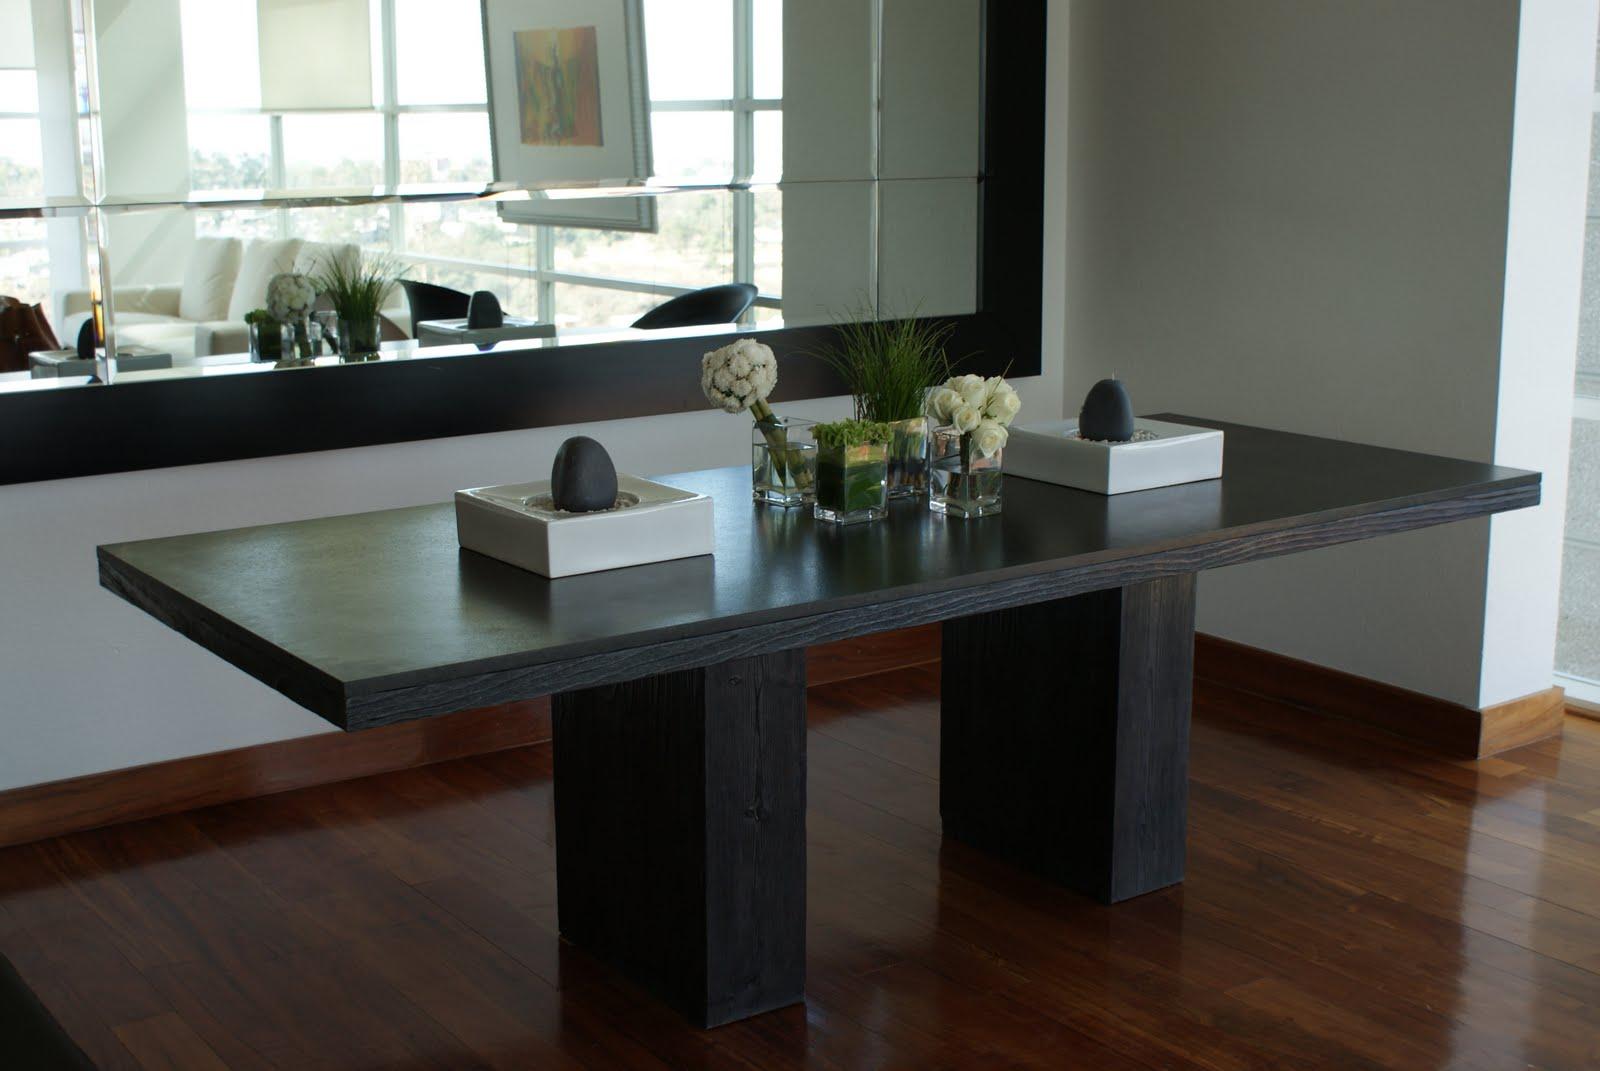 Mesa y espejo muebles sobre dise o avl for Muebles sobre diseno